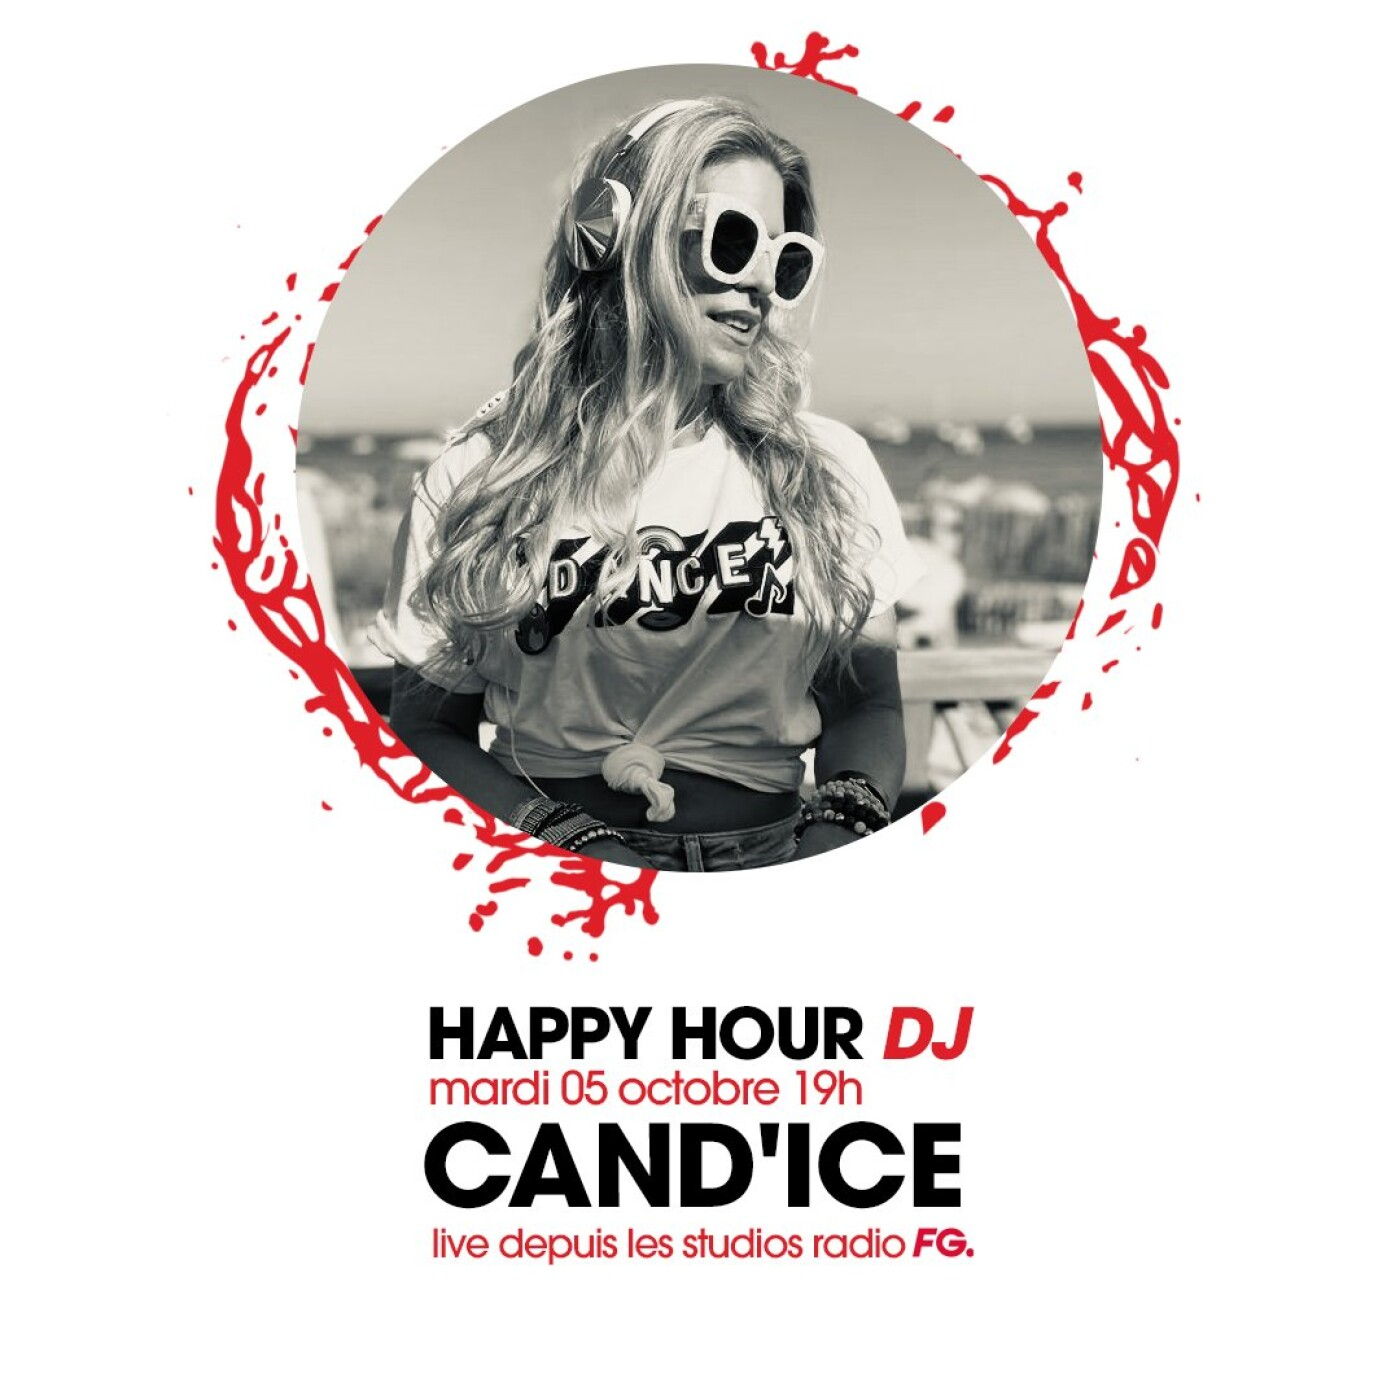 HAPPY HOUR DJ : CAND'ICE